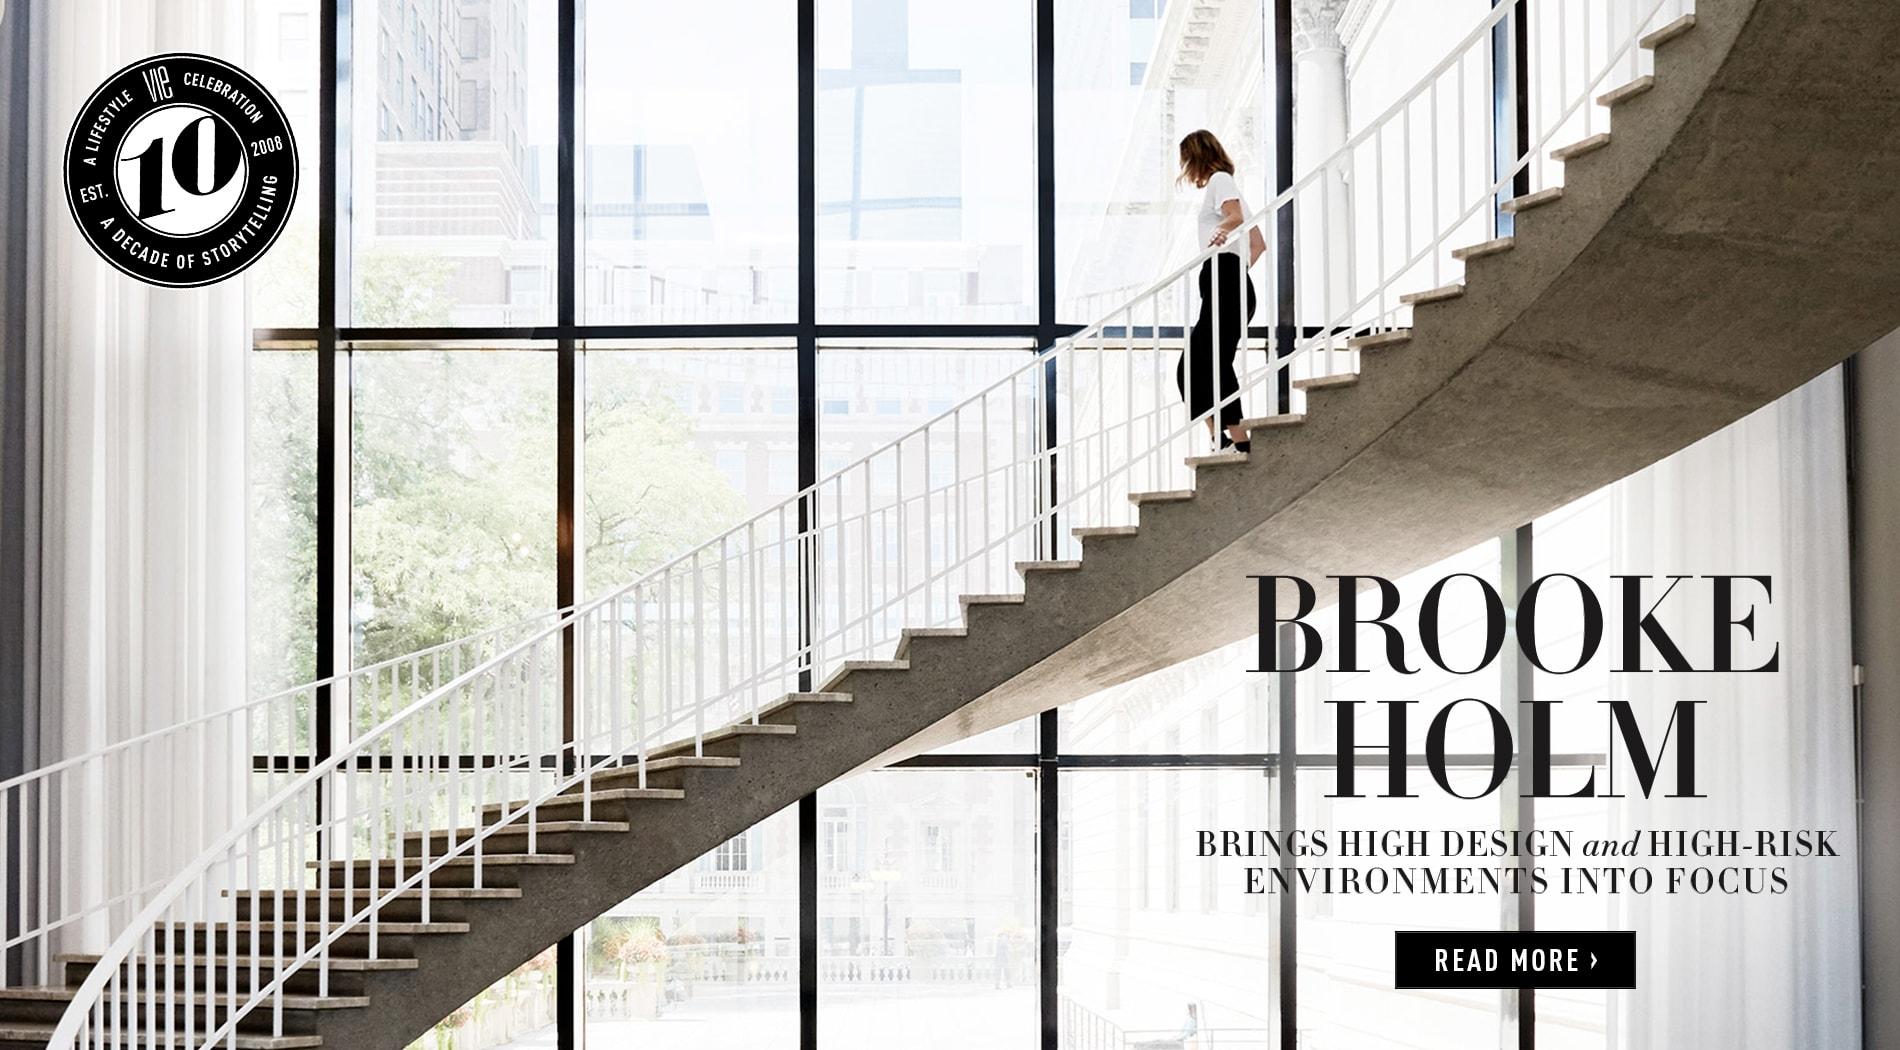 VIE Magazine - July 2018 Architecture & Design Issue - Brooke Holm